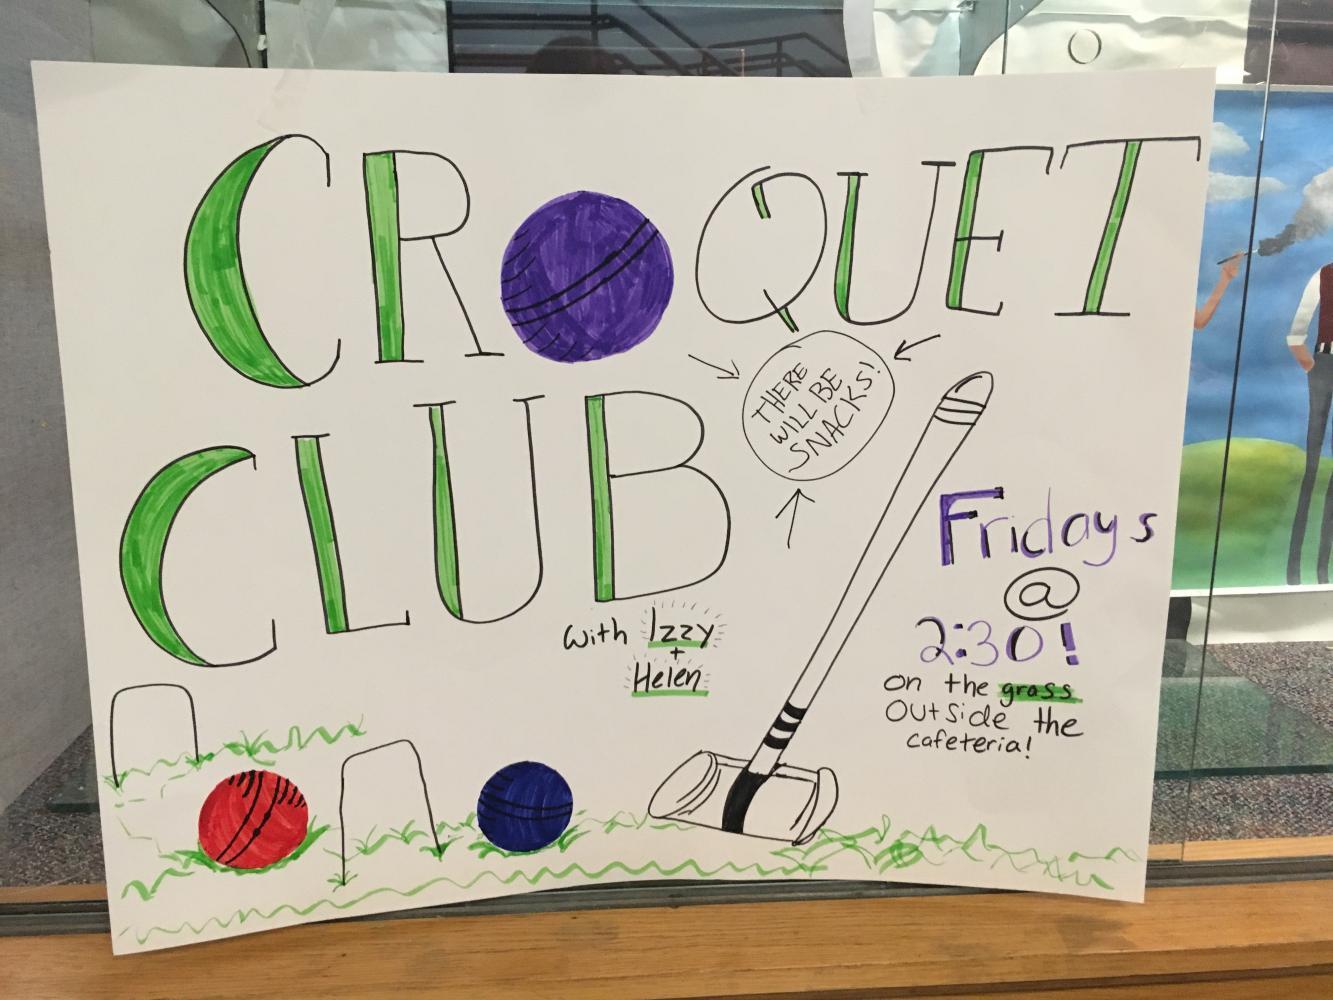 Croquet+Club